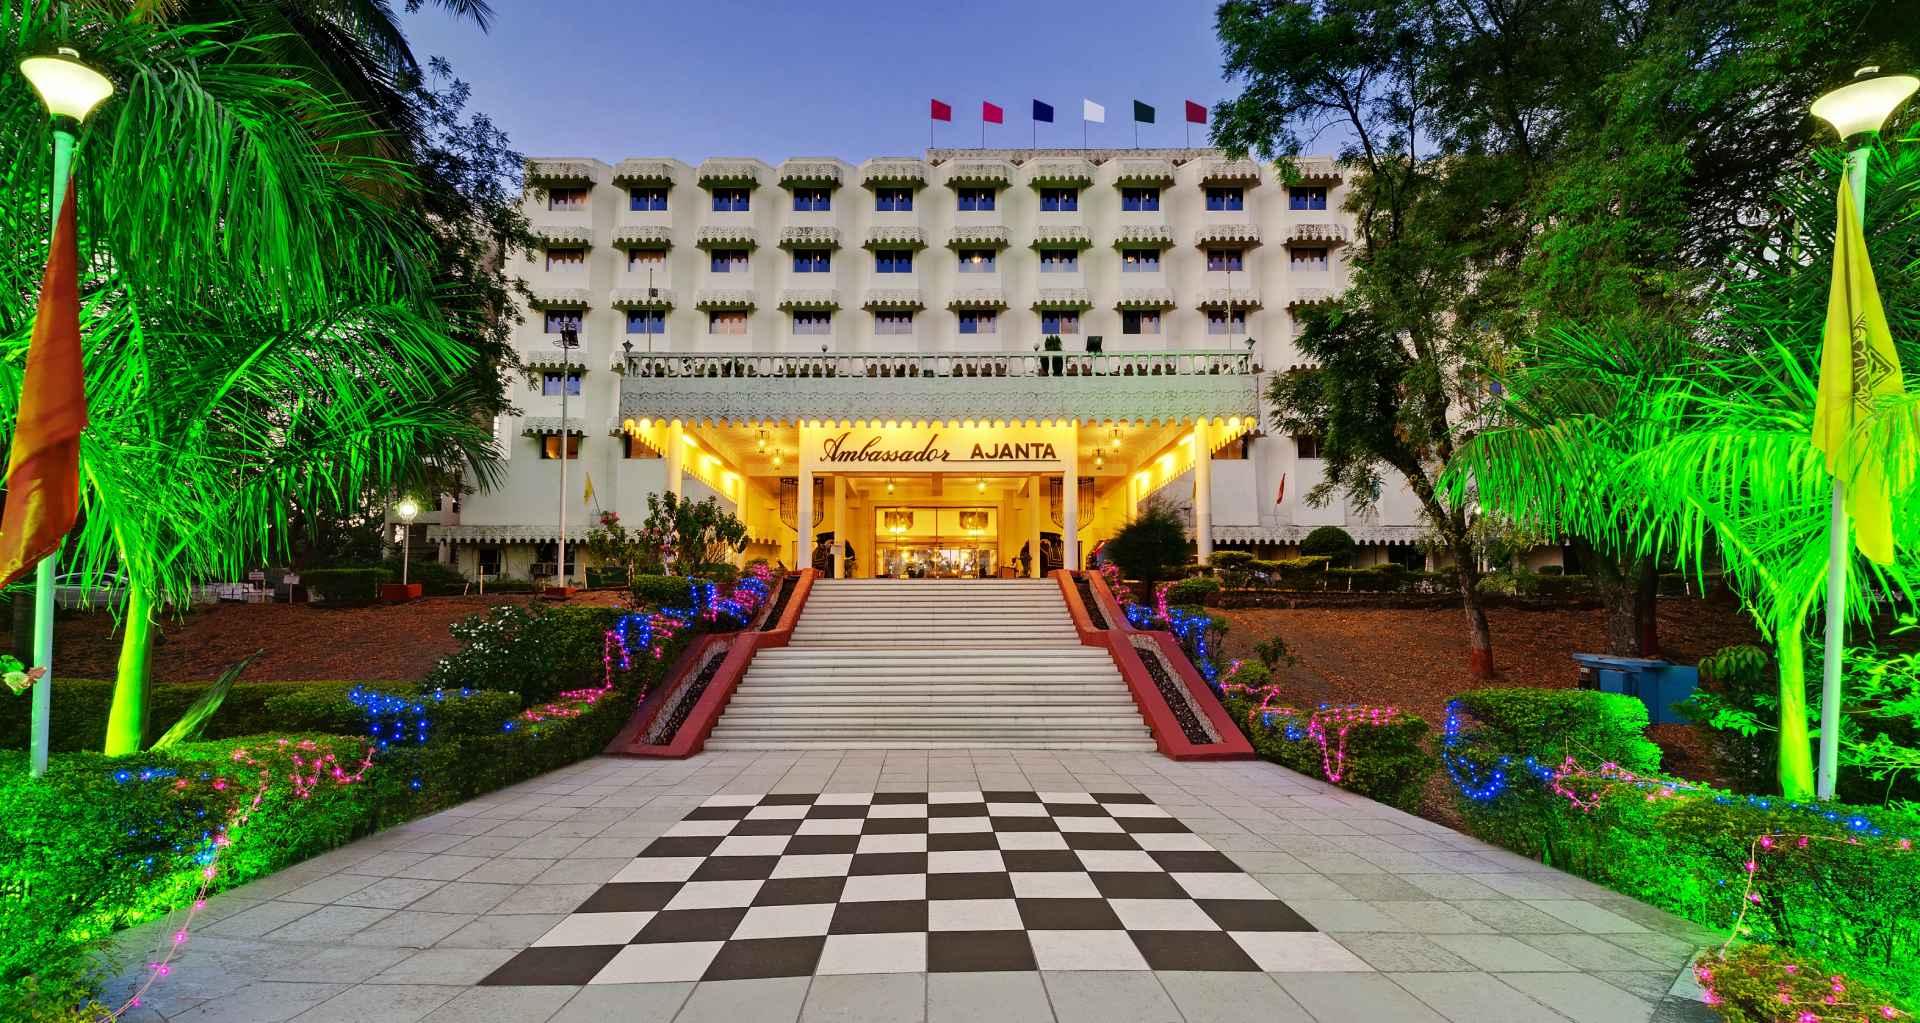 Exterior Aurangabad banner ambassador ajanta 1 - The Ambassador | Heritage Hotels in Mumbai, Aurangabad, Chennai - Gallery